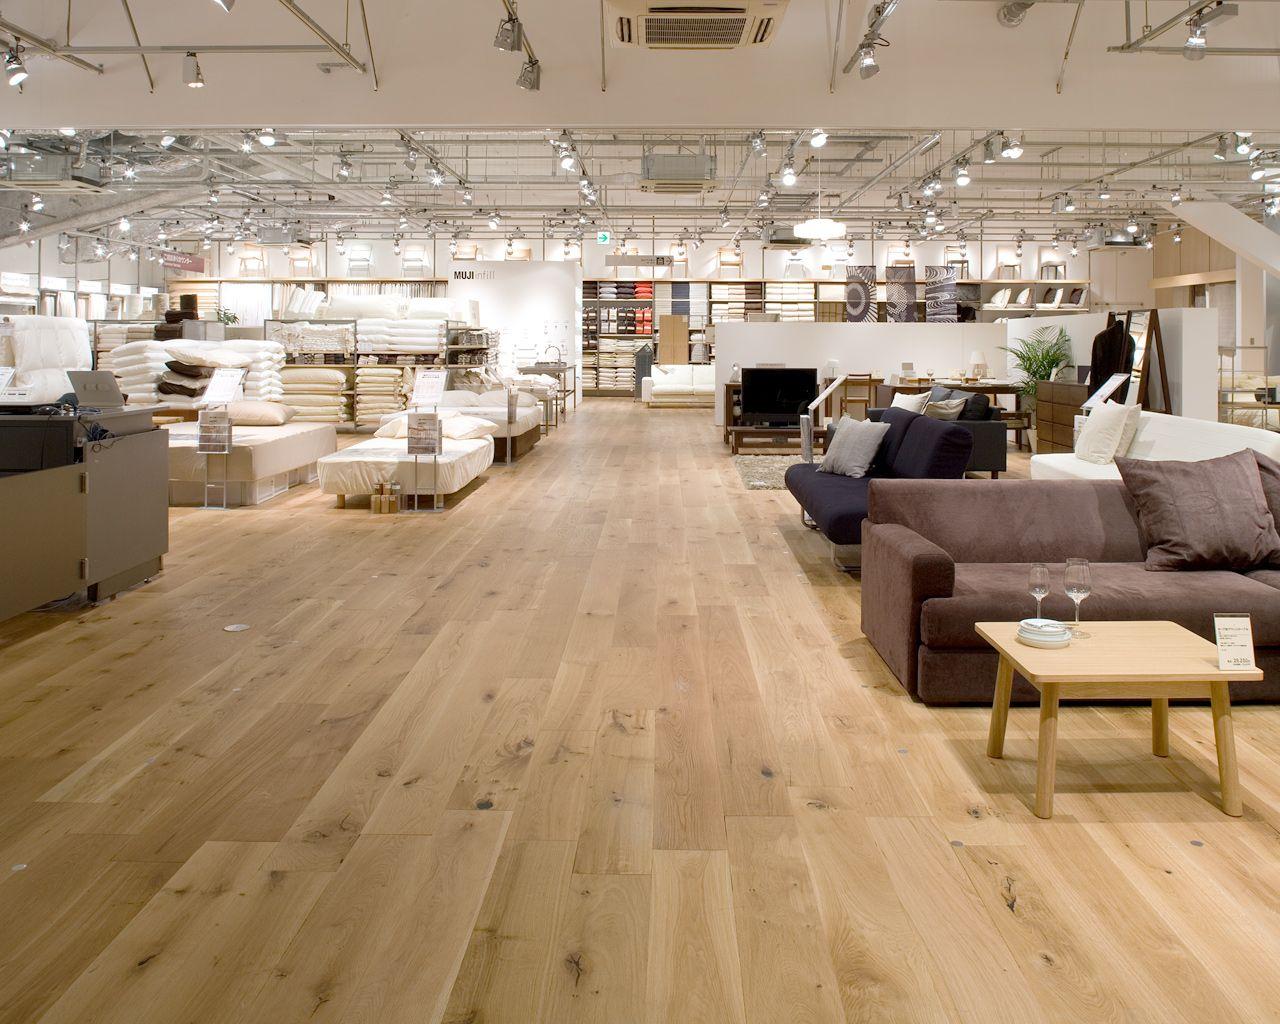 images about Muji on Pinterest Mattress Living furniture